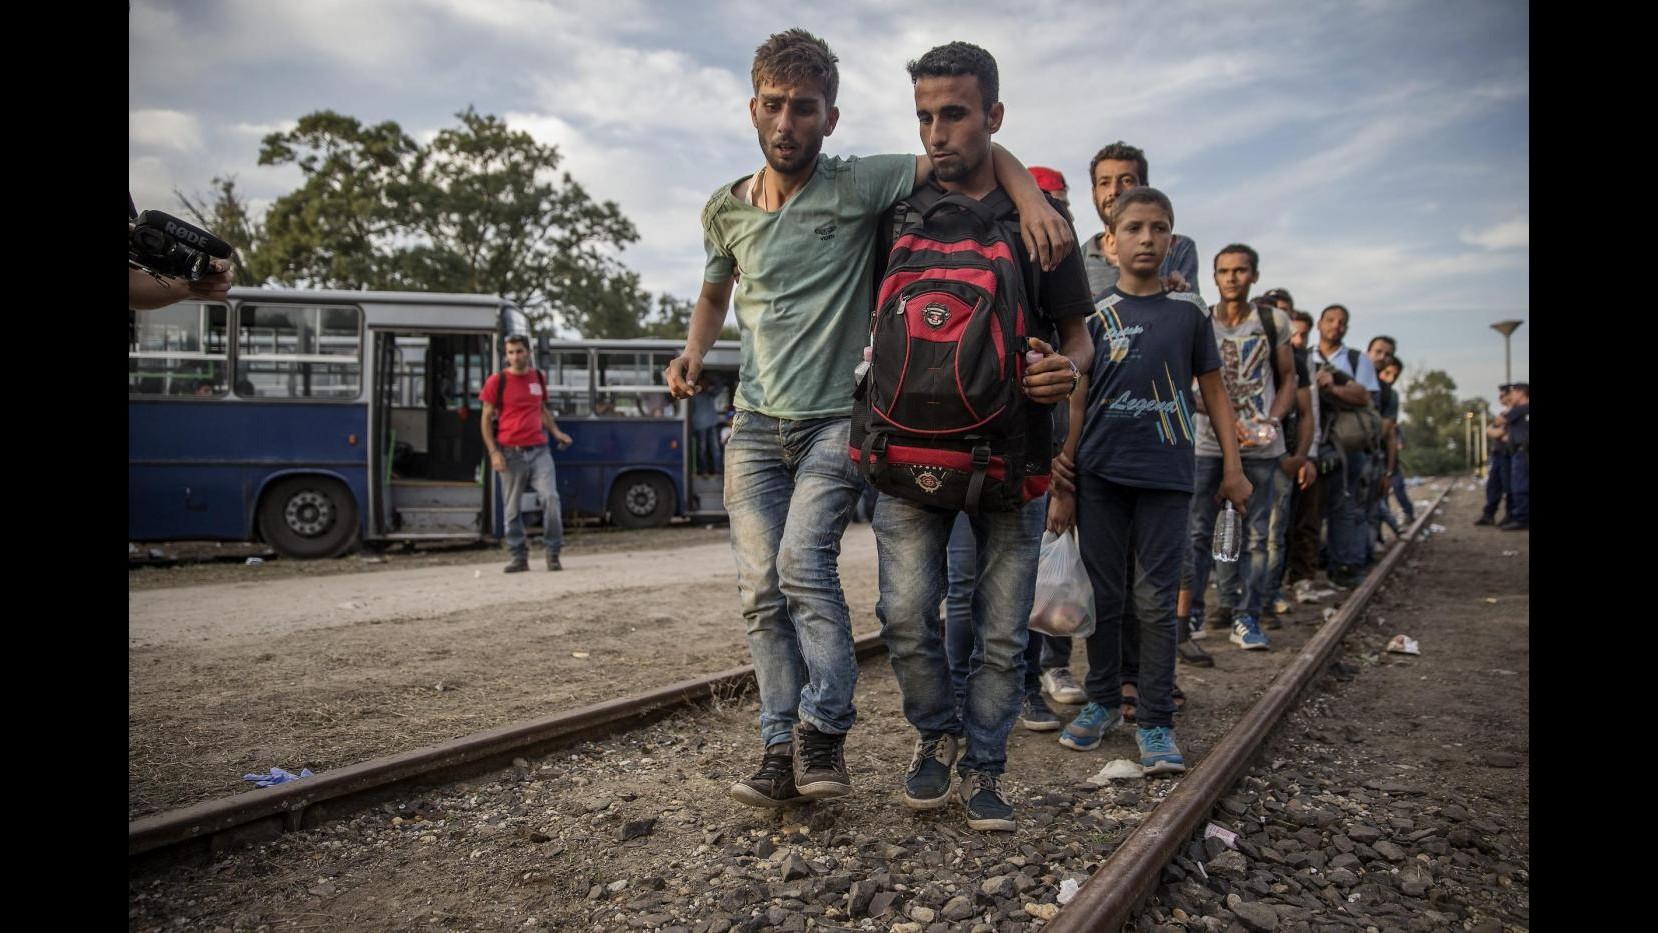 Migranti, Ue: 10 milioni a Slovenia per gestire arrivi